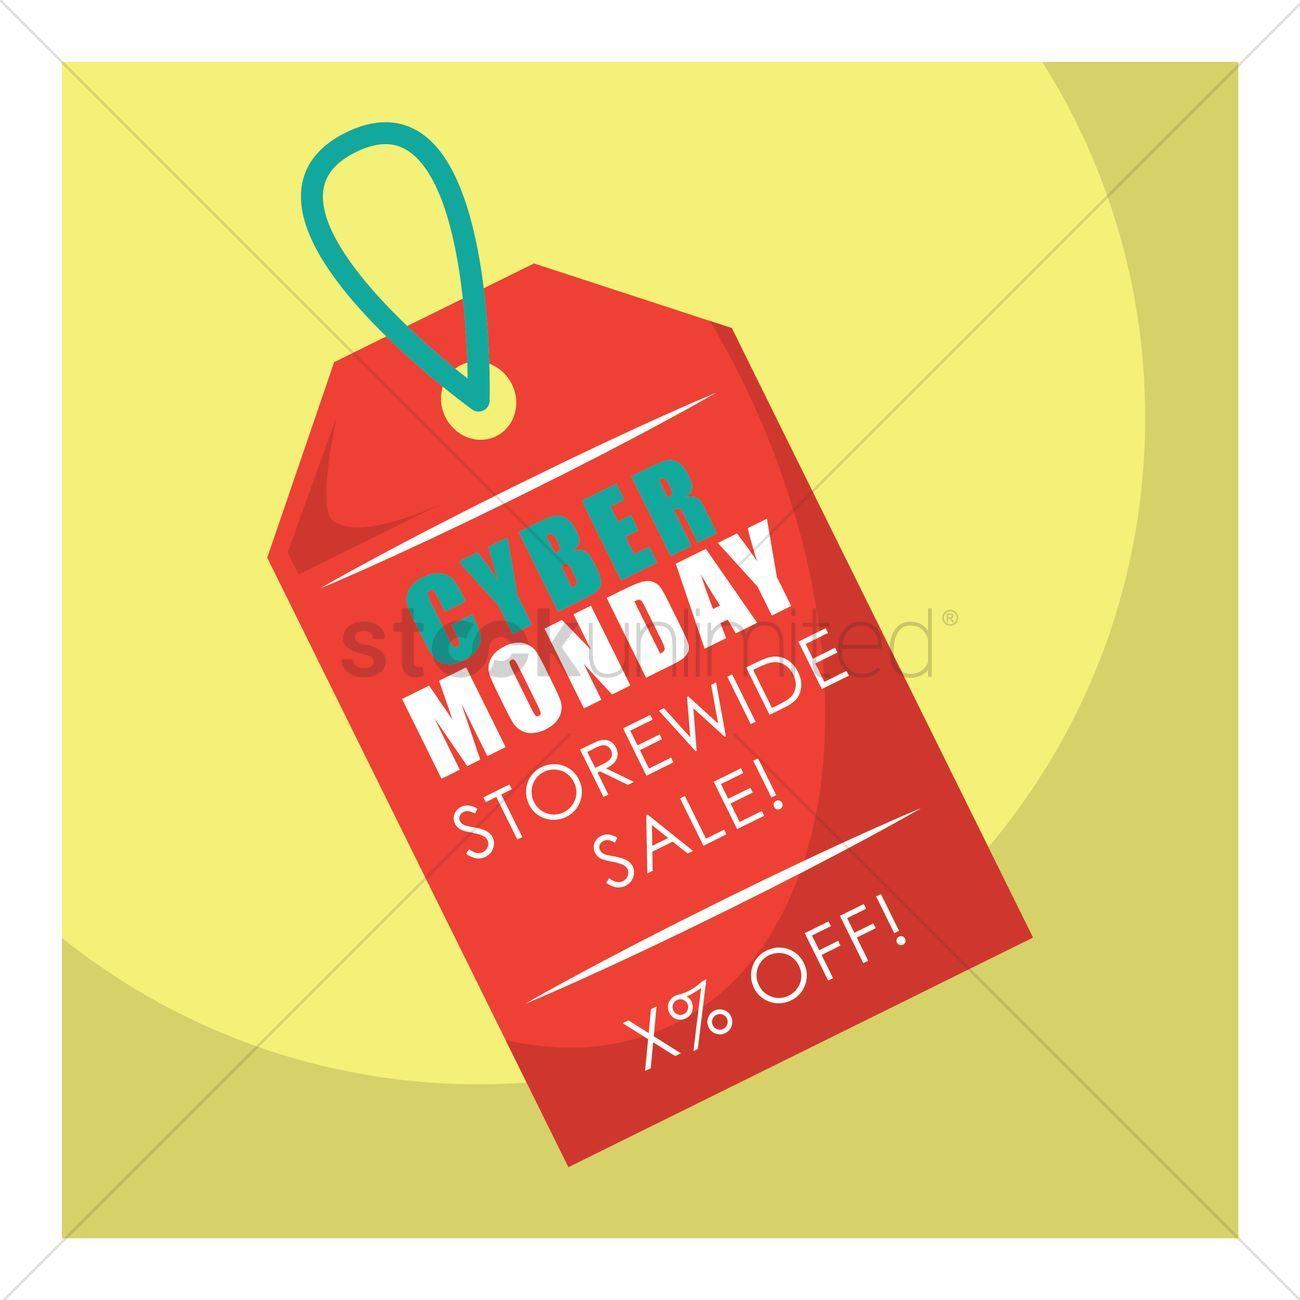 Cyber monday sale tag vectors stock clipart